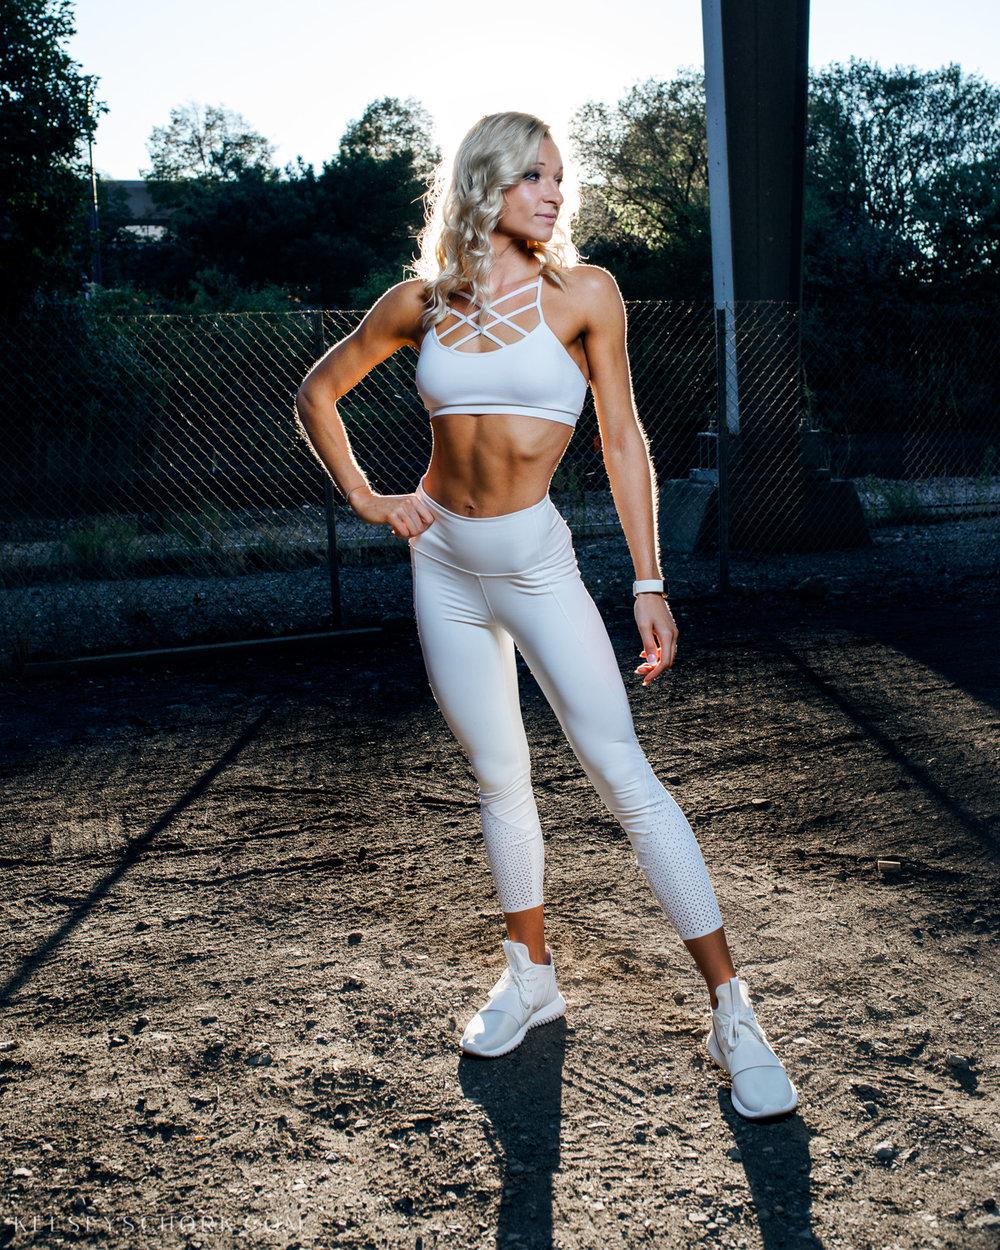 Bikini_Fitness_Jaimie_Buffalo-23.jpg